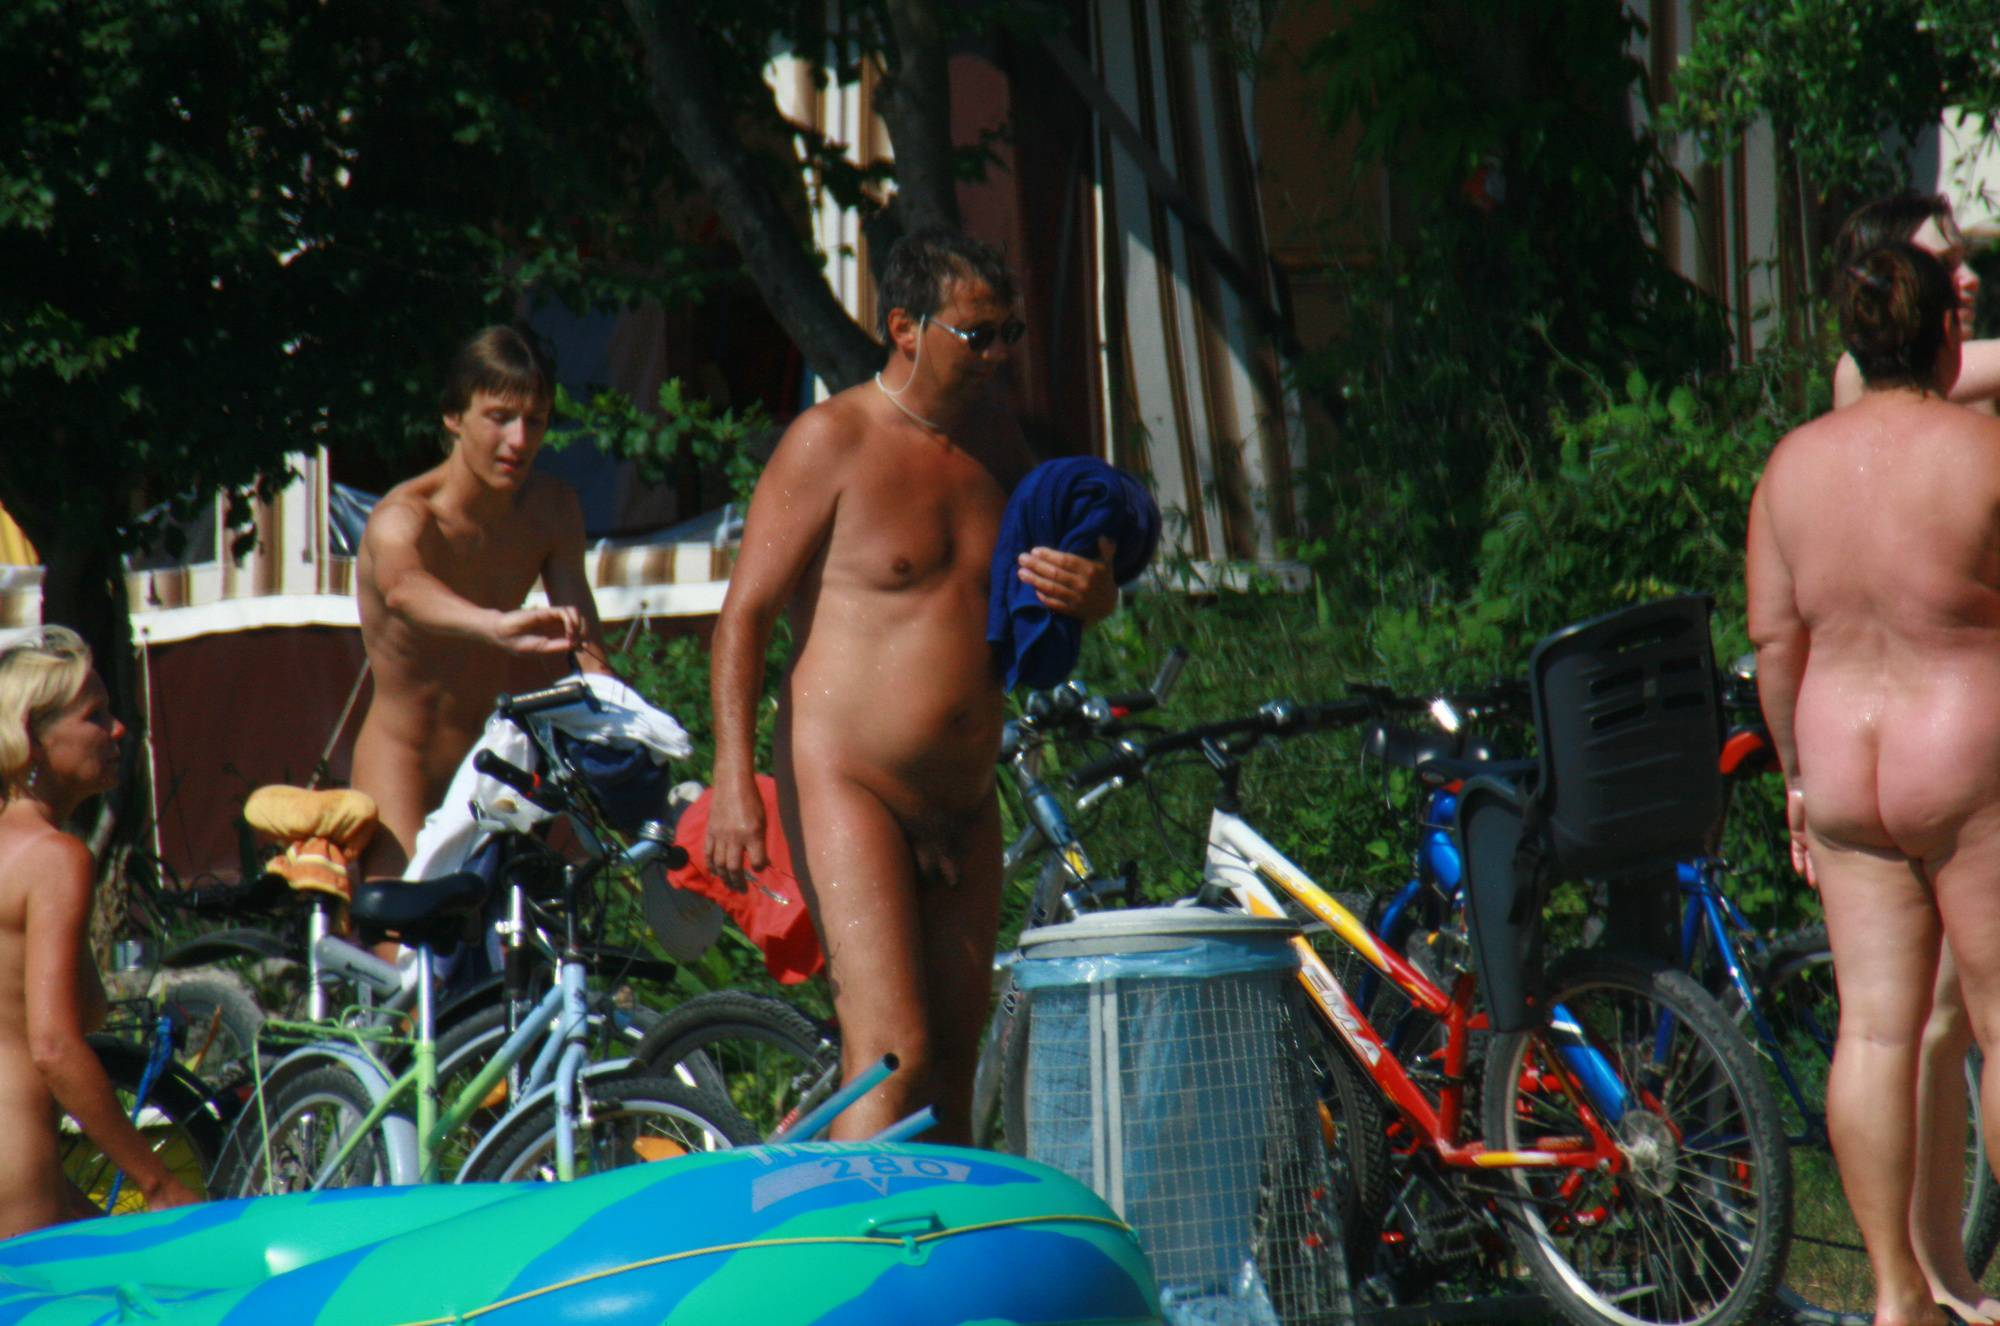 Purenudism Images-Naturist Outdoor Showers - 4